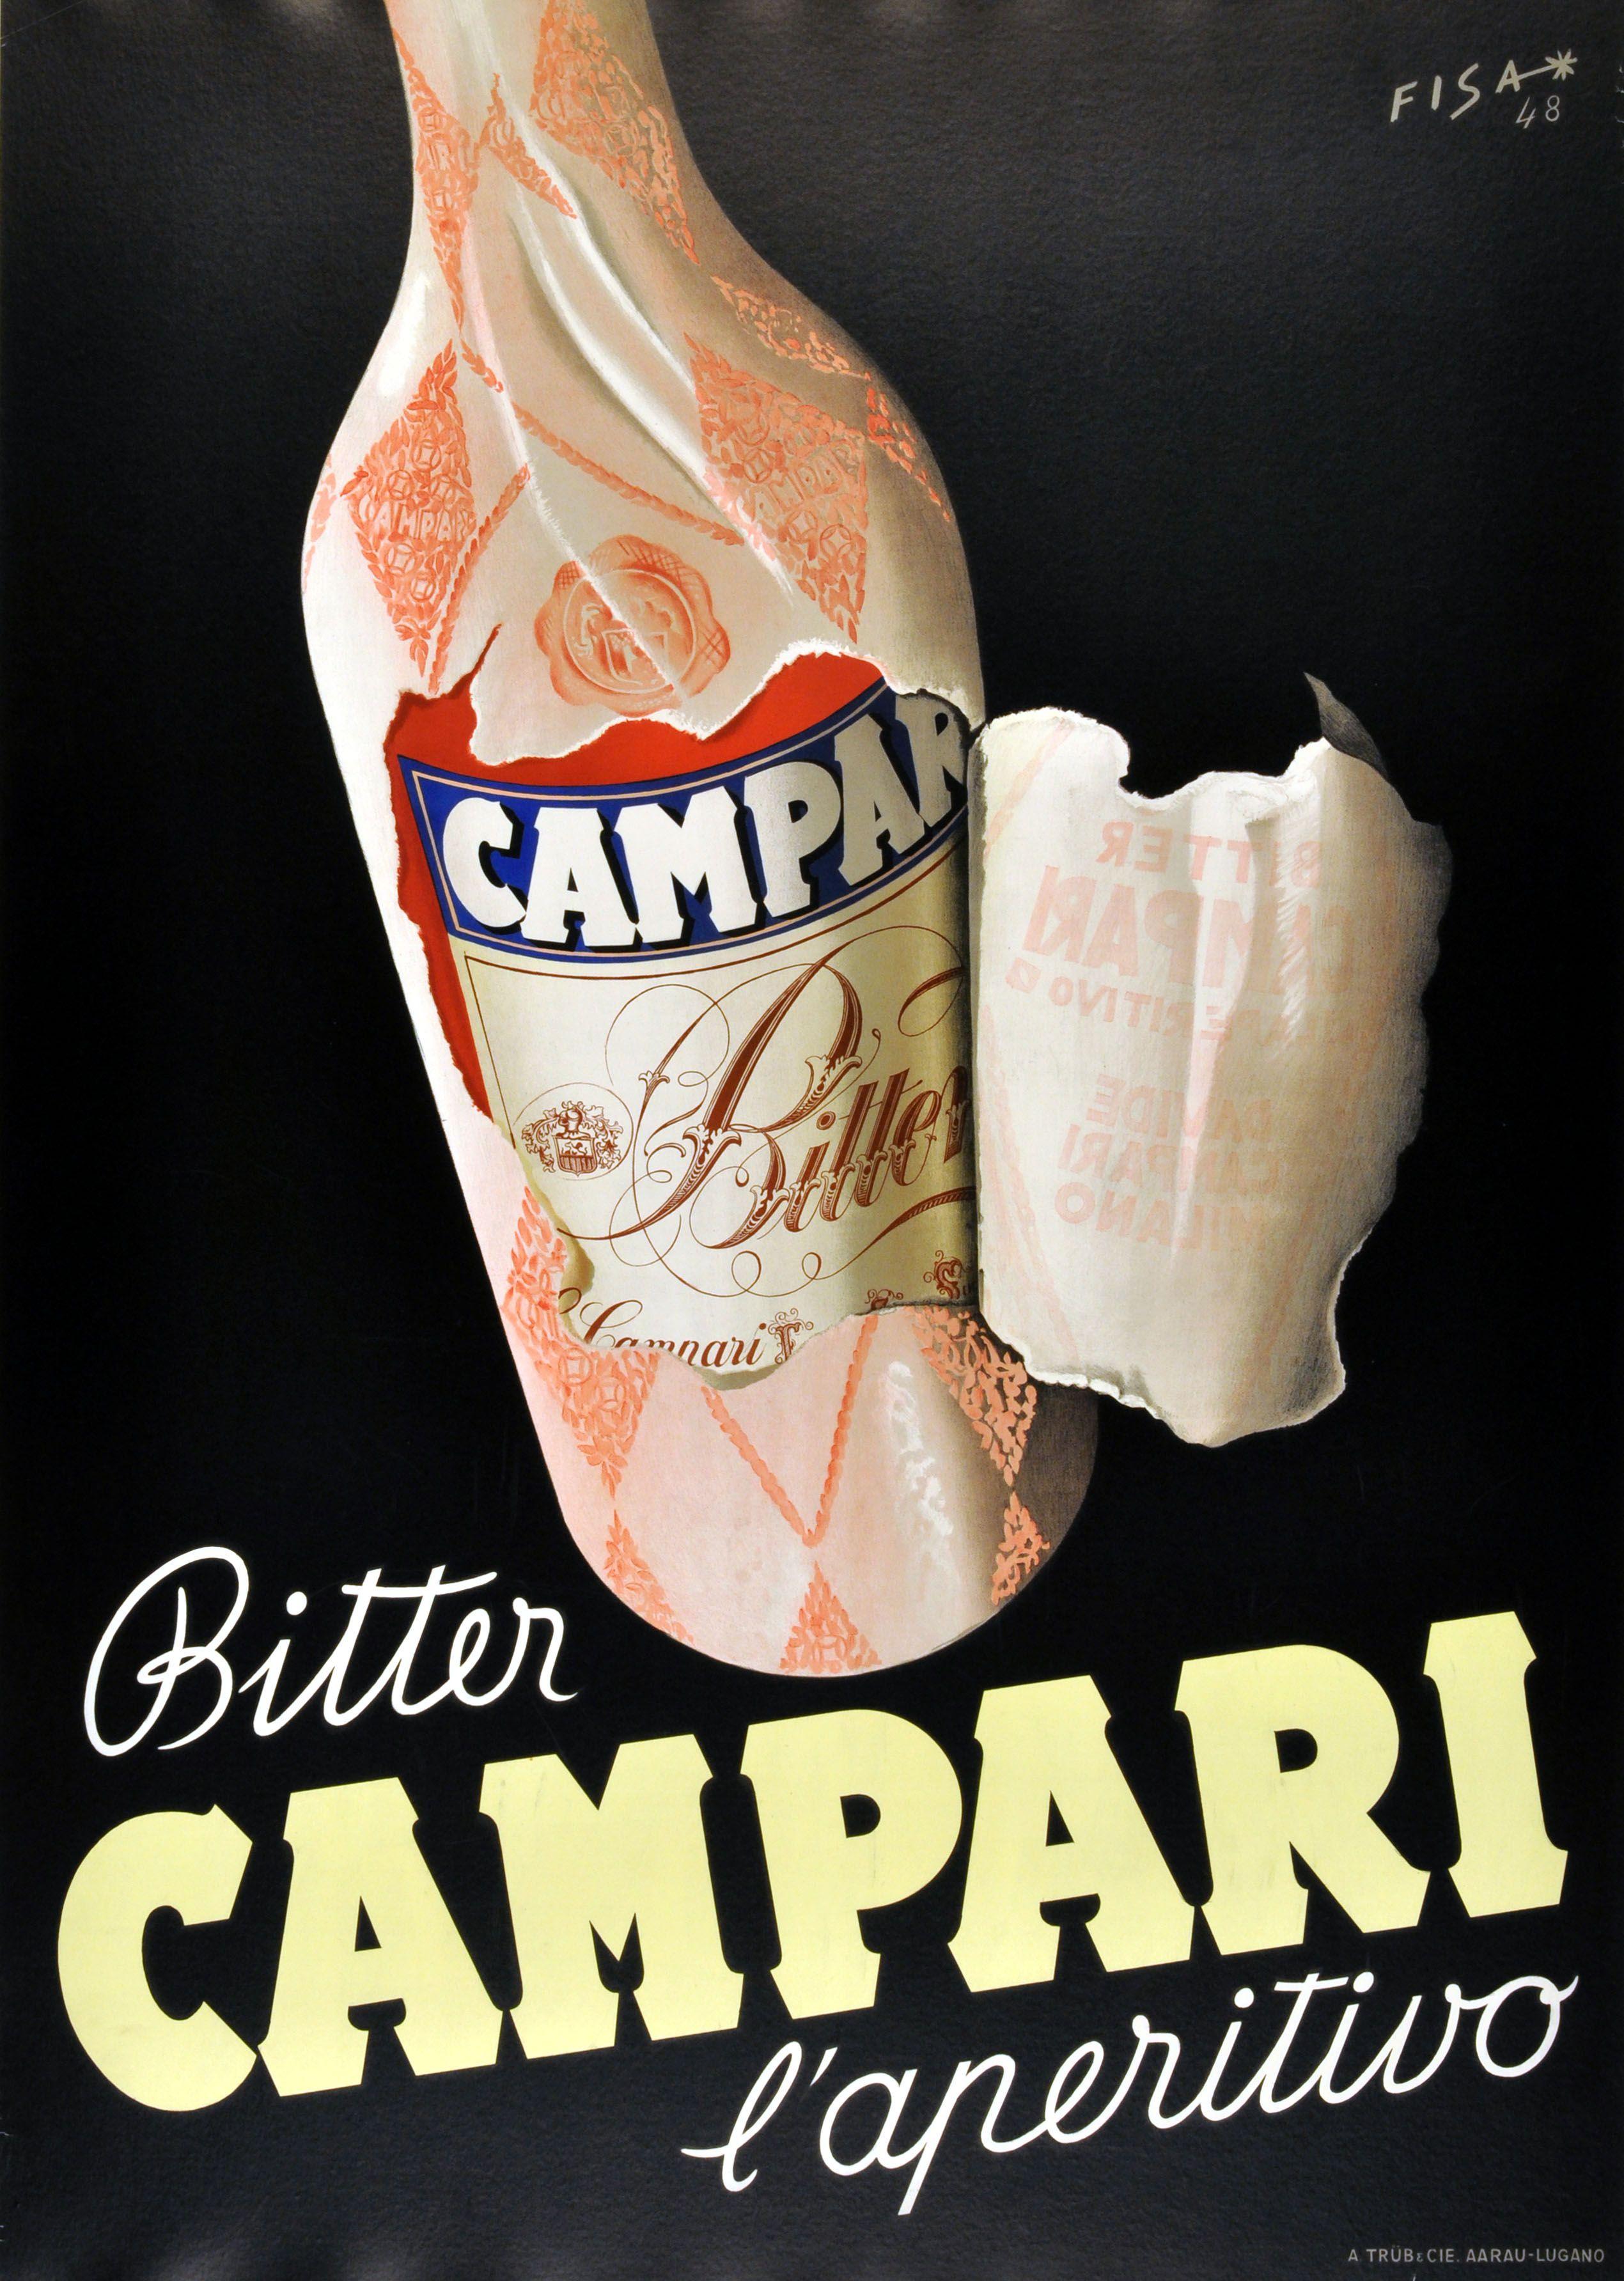 Campari Bitter Aperitif, 1948 - original vintage poster by Alois Fisarek listed on AntikBar.co.uk